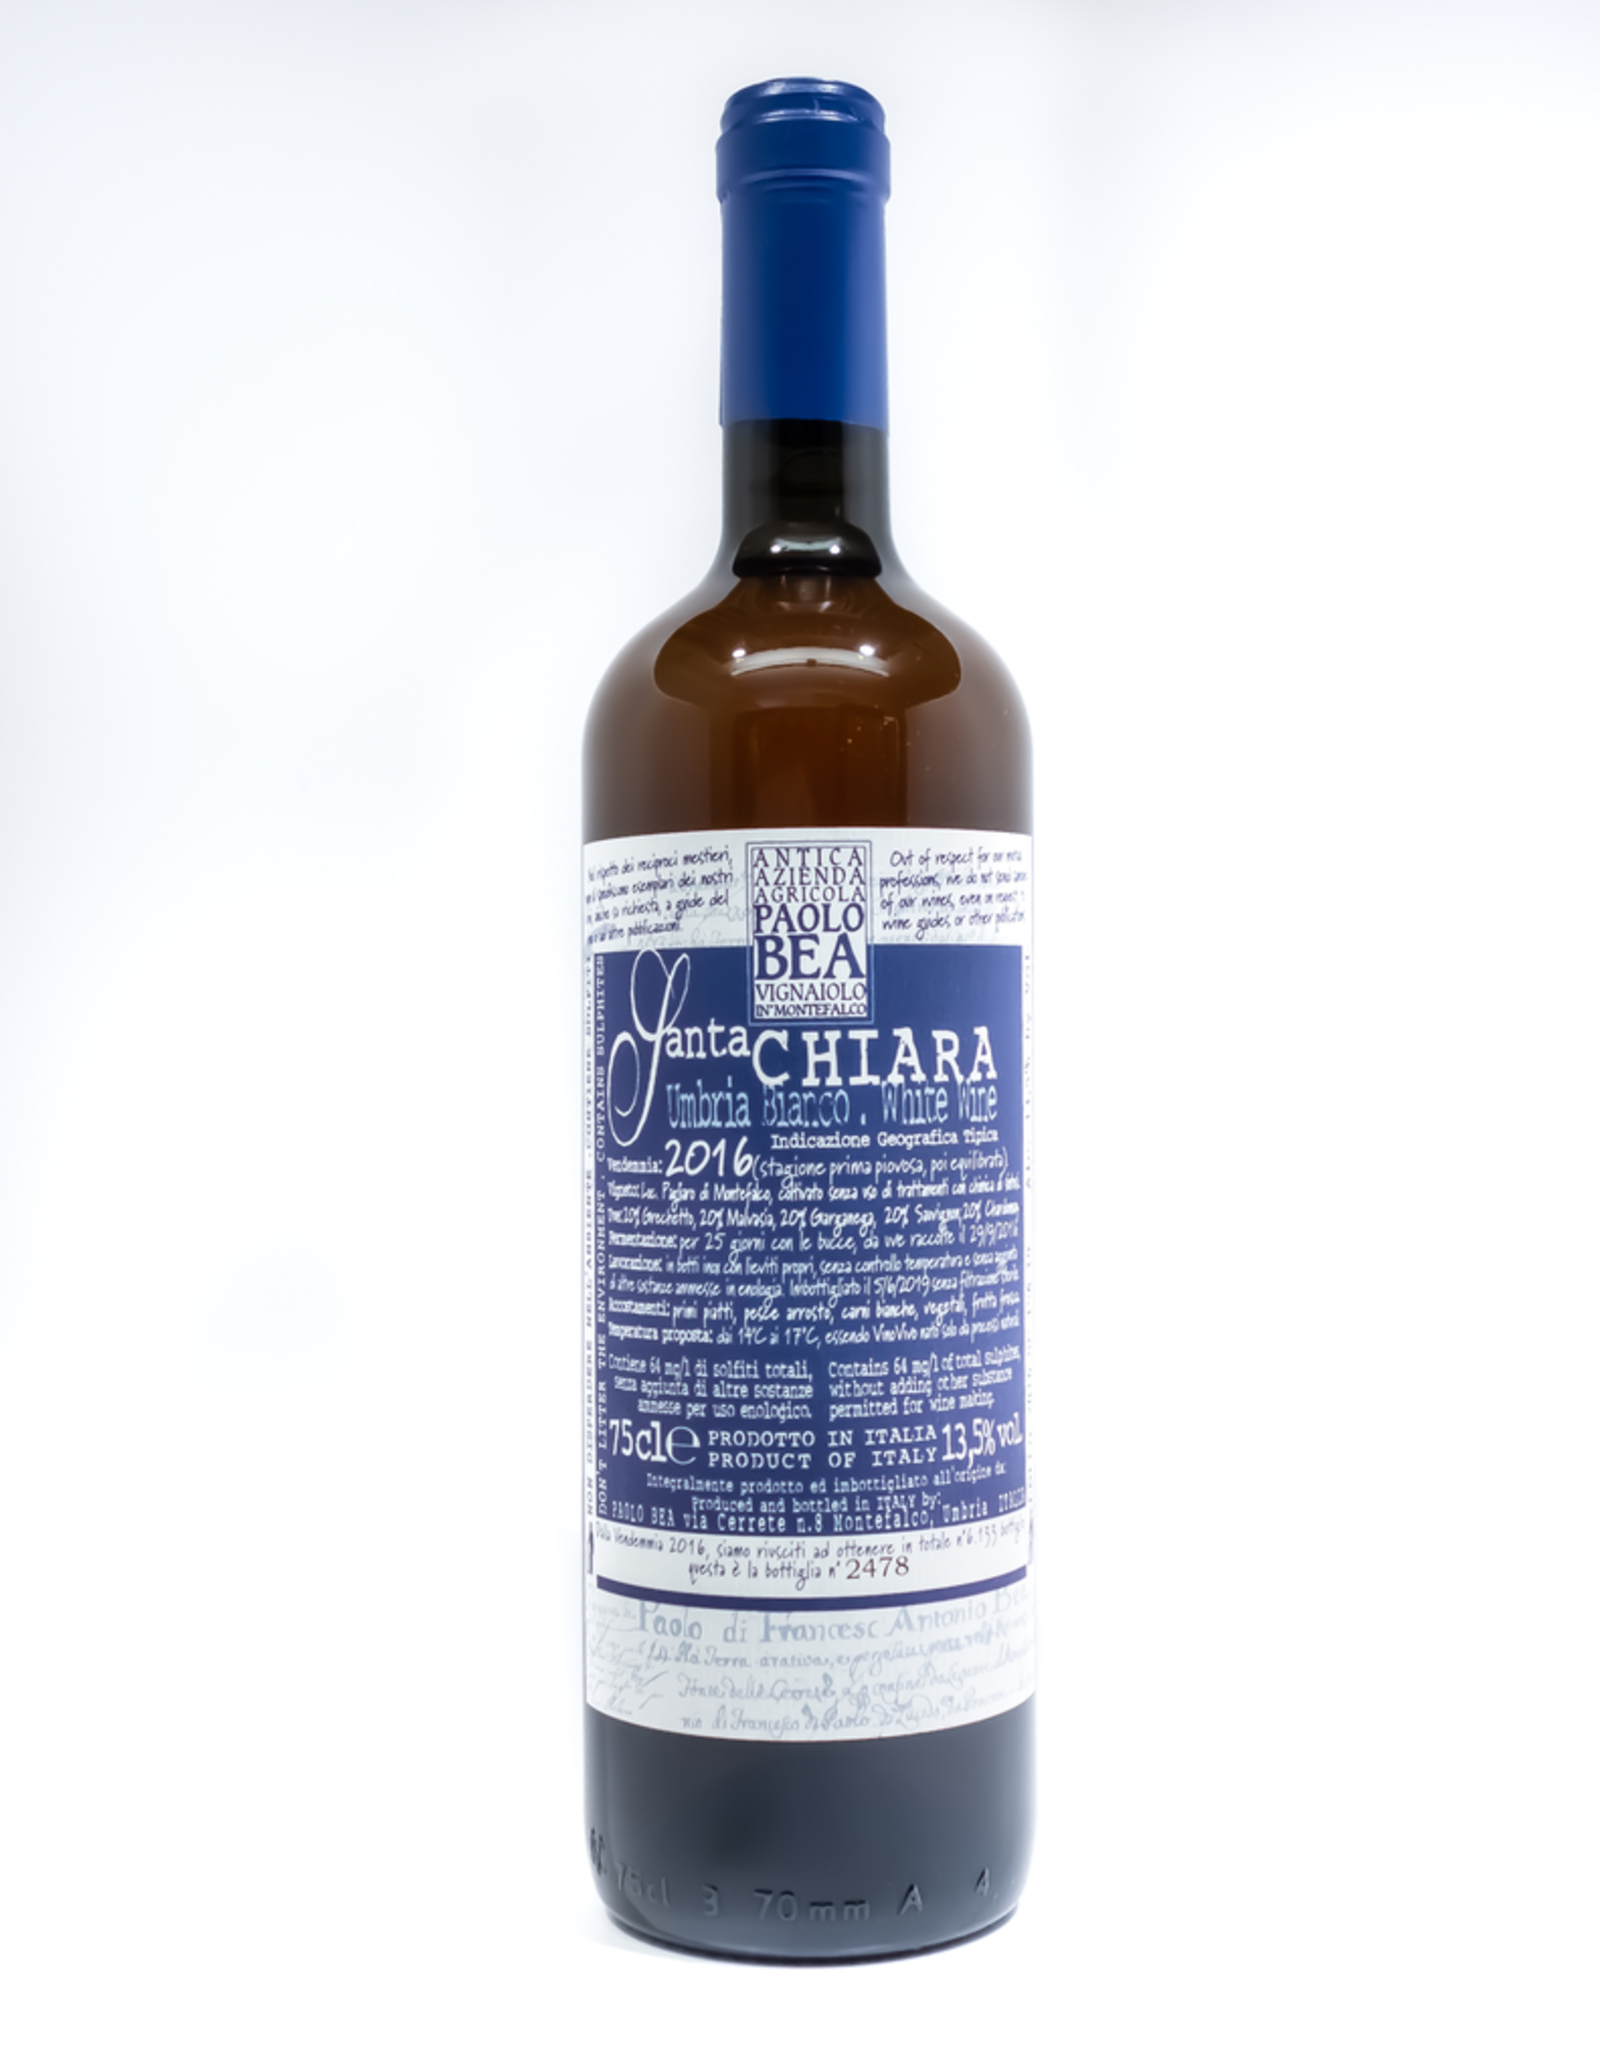 Wine-Orange/Skin-fermented Paolo Bea 'Santa Chiara' Umbria Bianco 2016